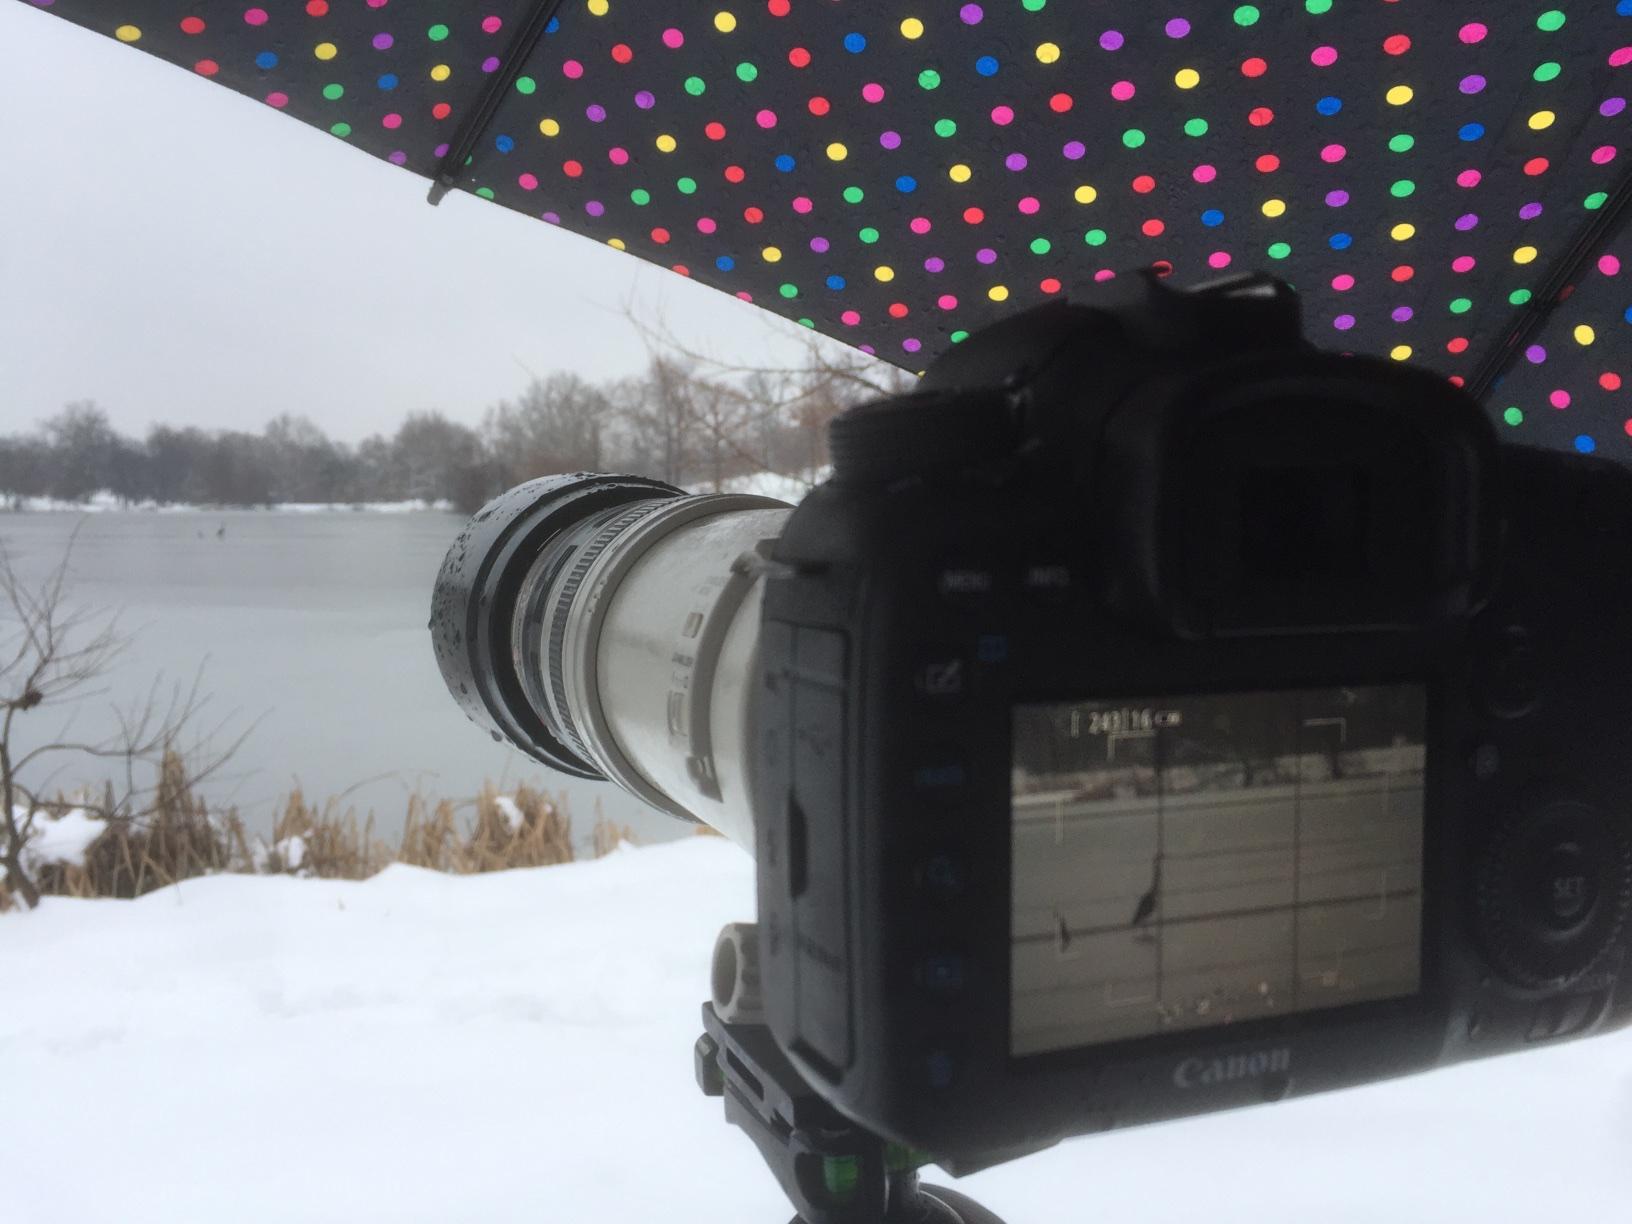 Under the umbrella with my camera.